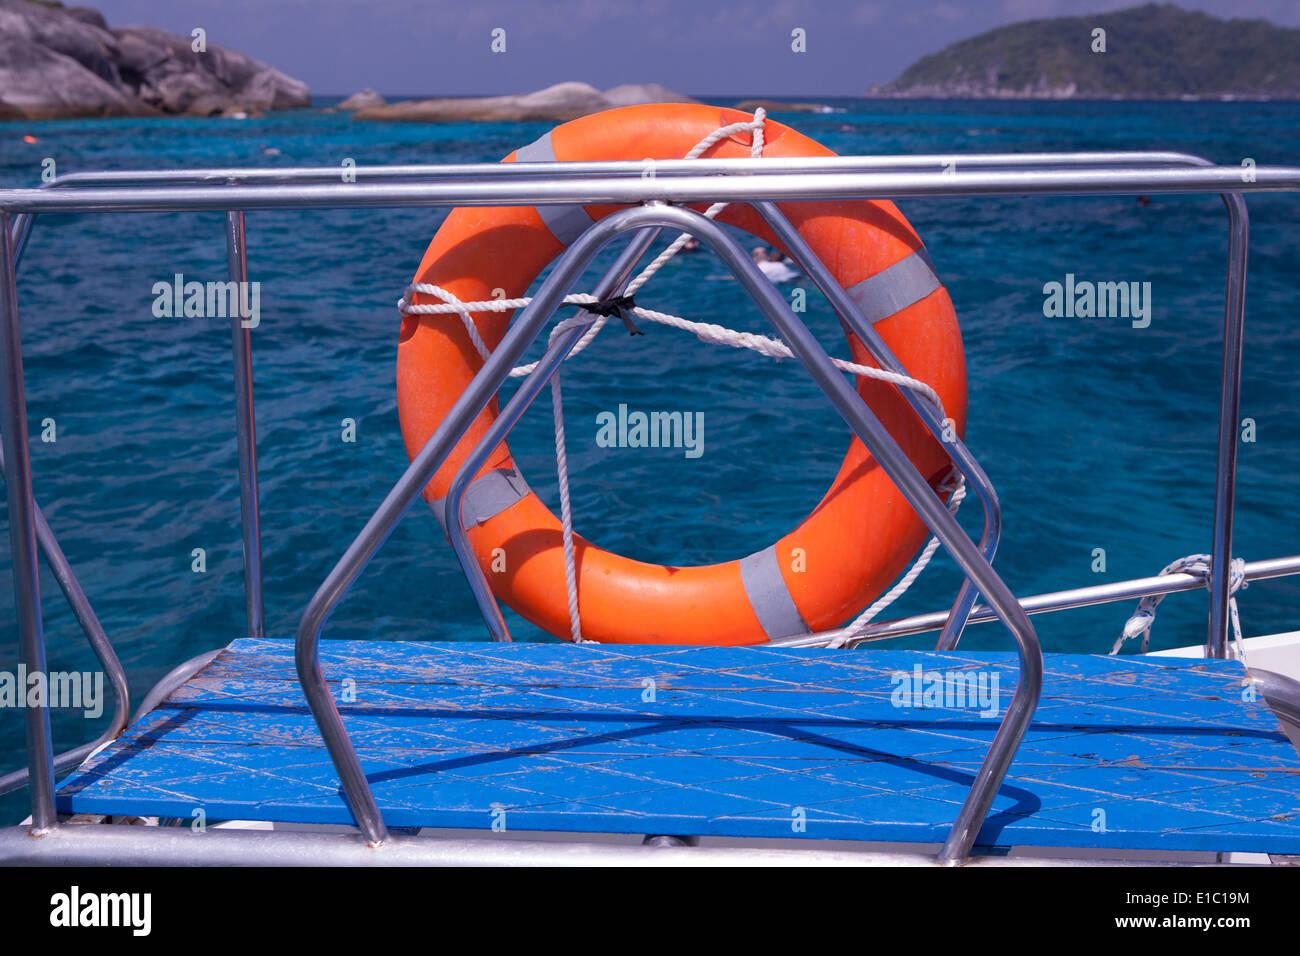 orange life saver on speedboat - Stock Image